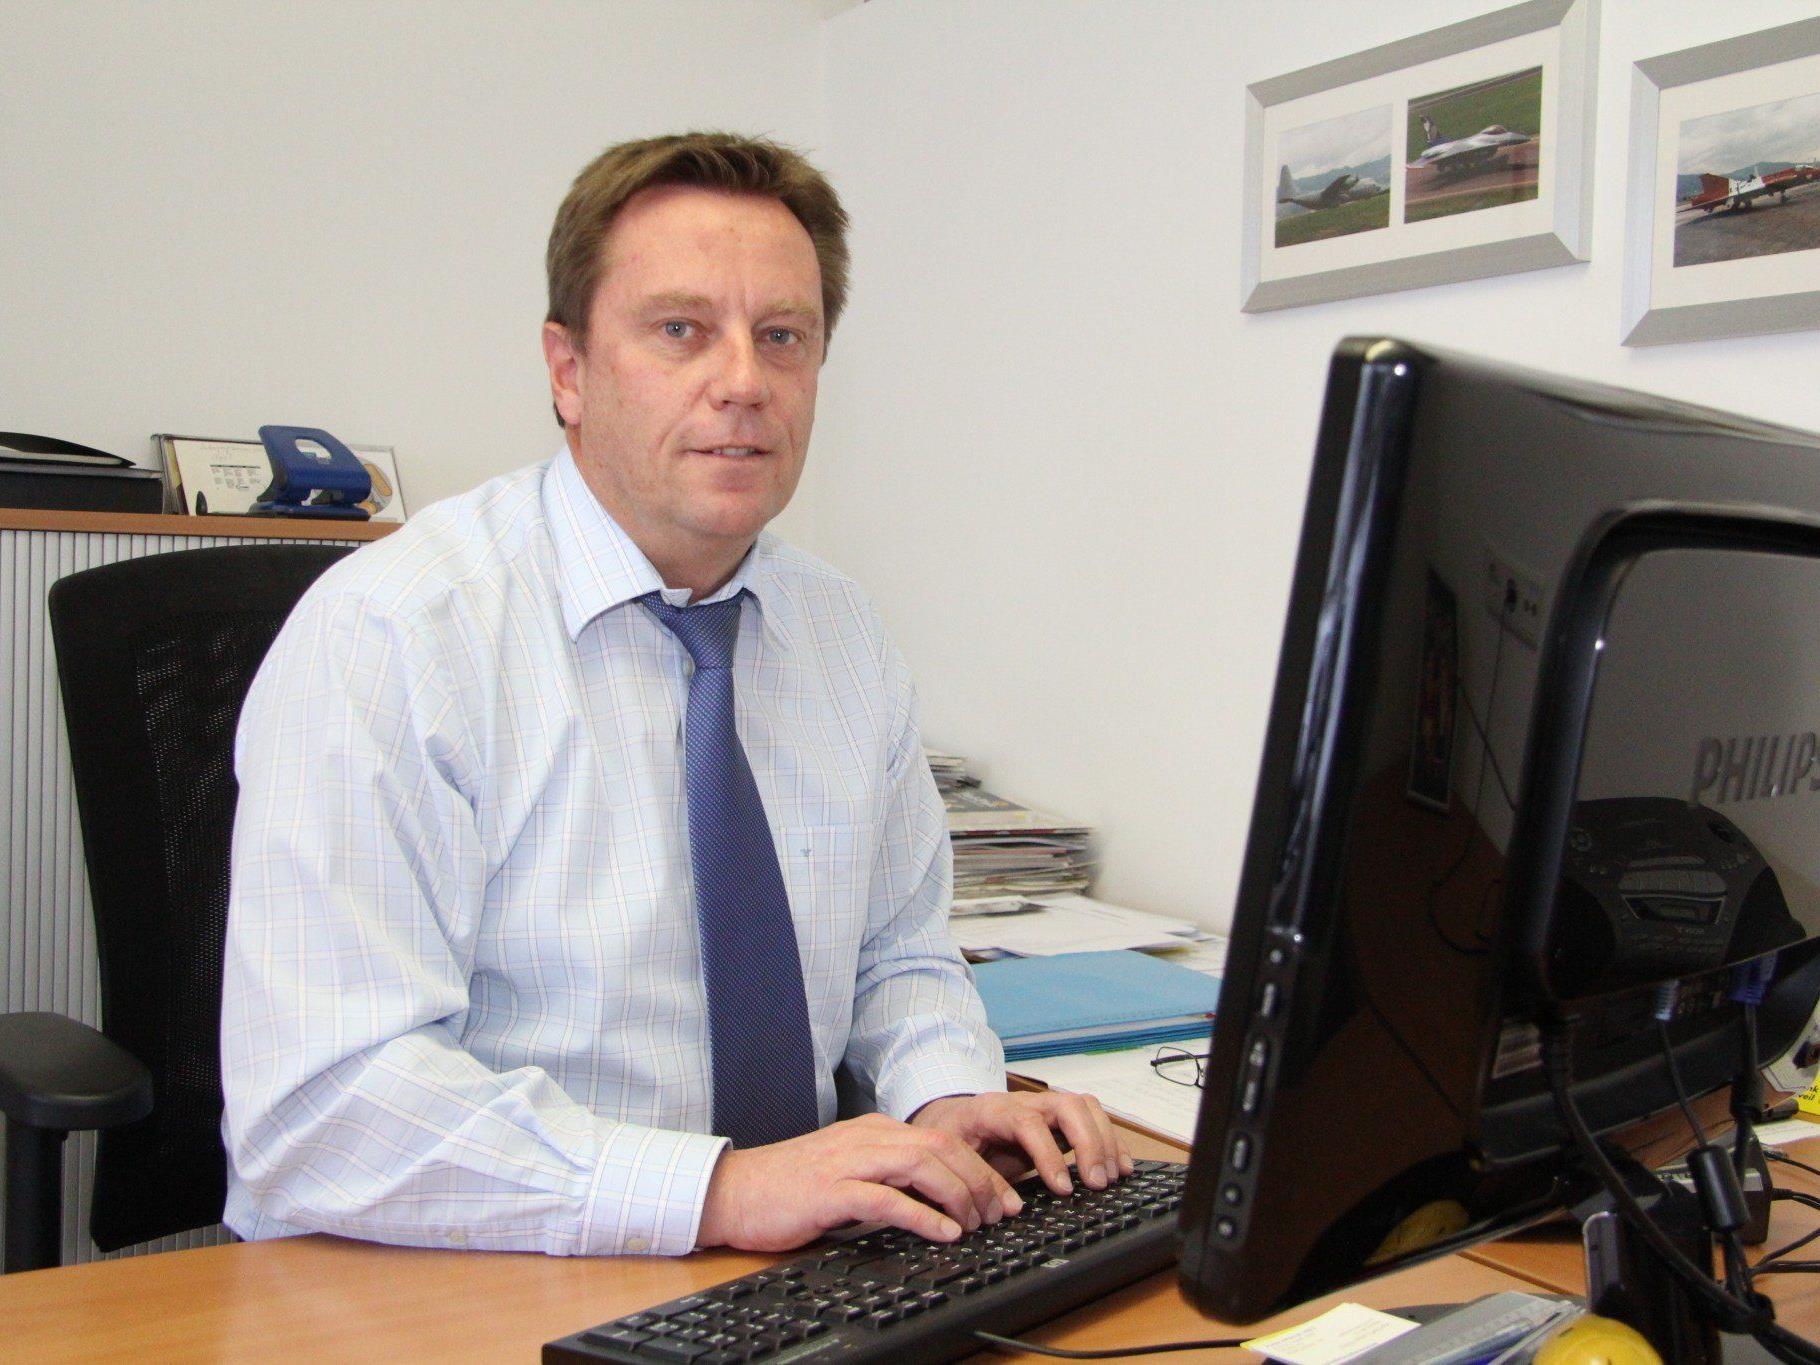 Finanzexperte Markus Salzgeber.